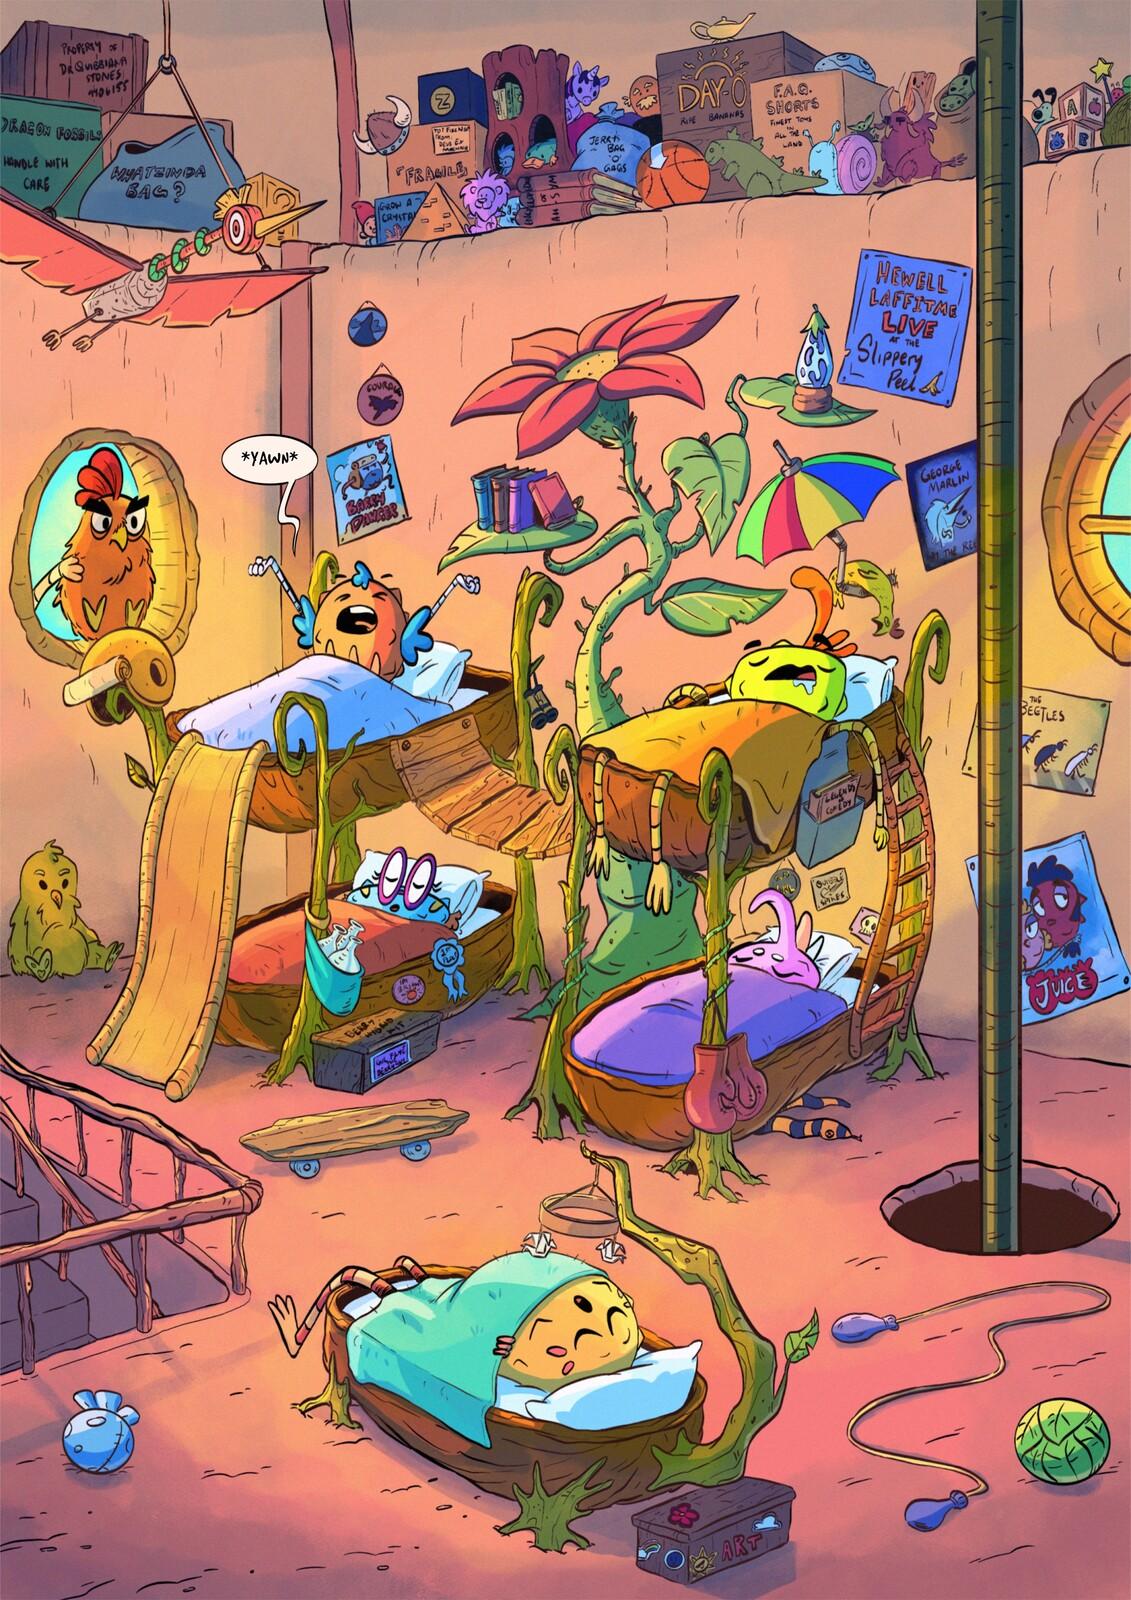 Unreleased Children's Graphic Novel